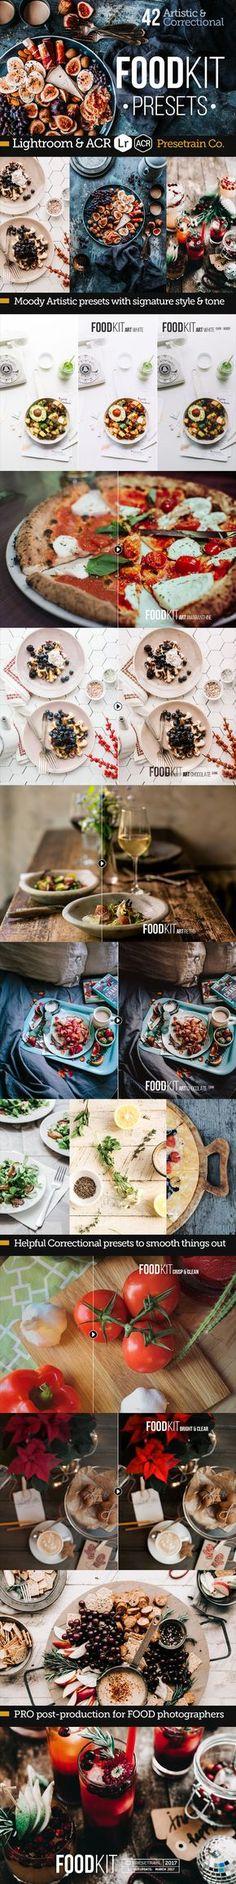 FoodKit - 42 Food Presets for Lightroom & ACR